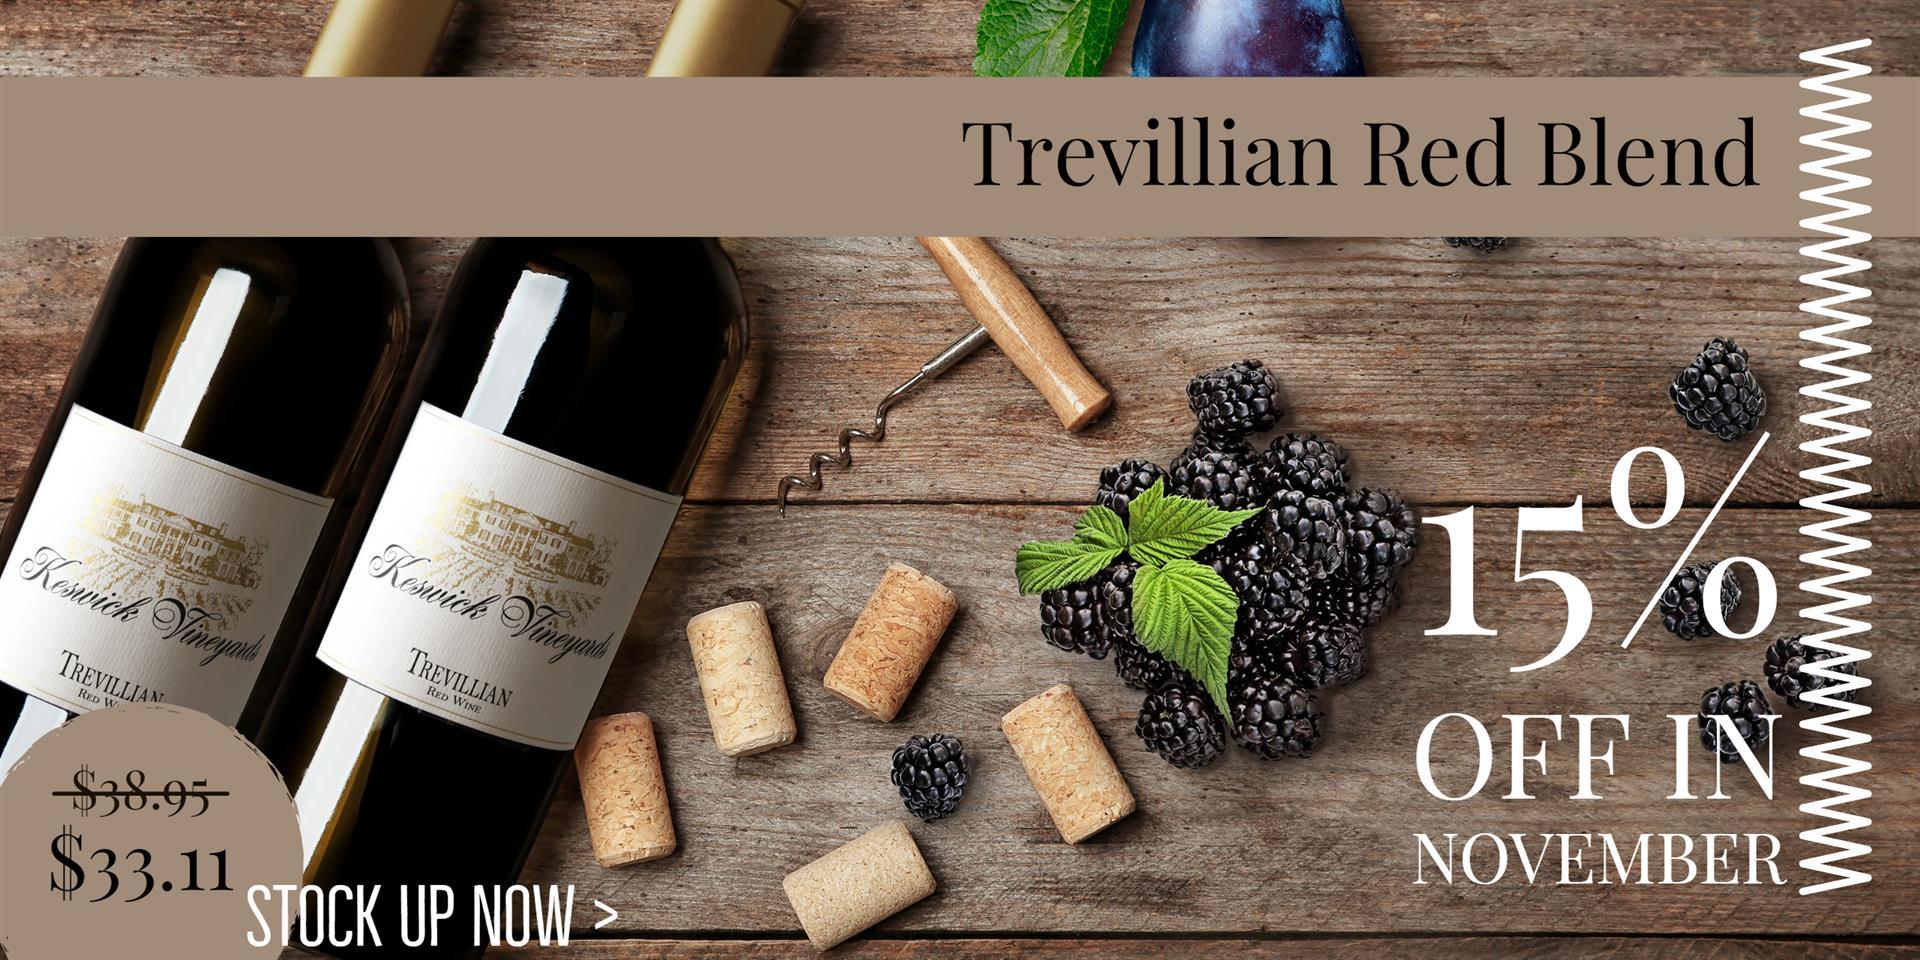 Trevillian Red On Sale through November